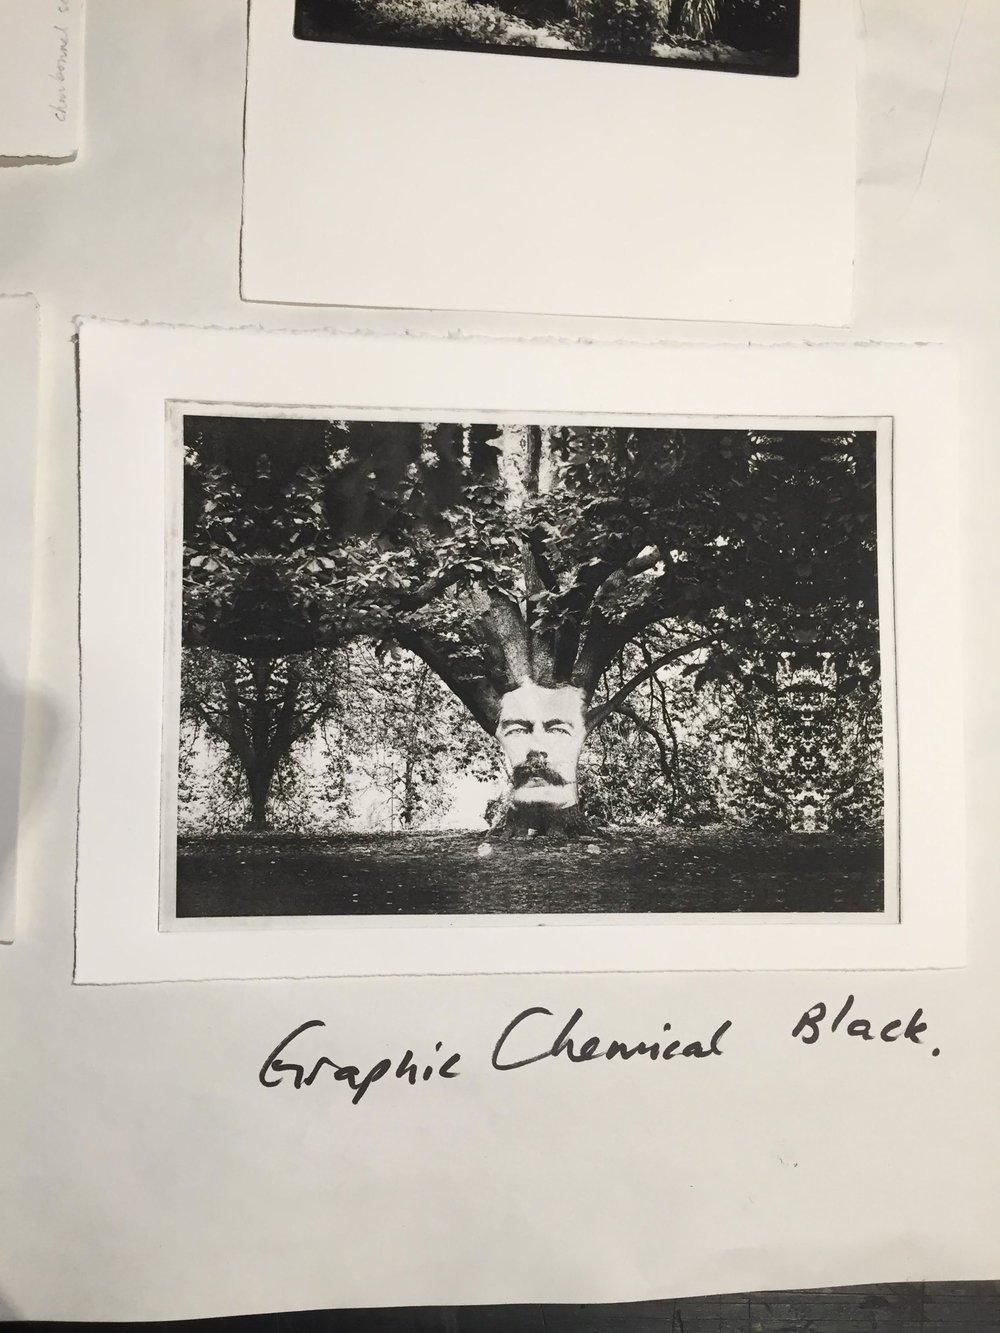 Photogravure proof